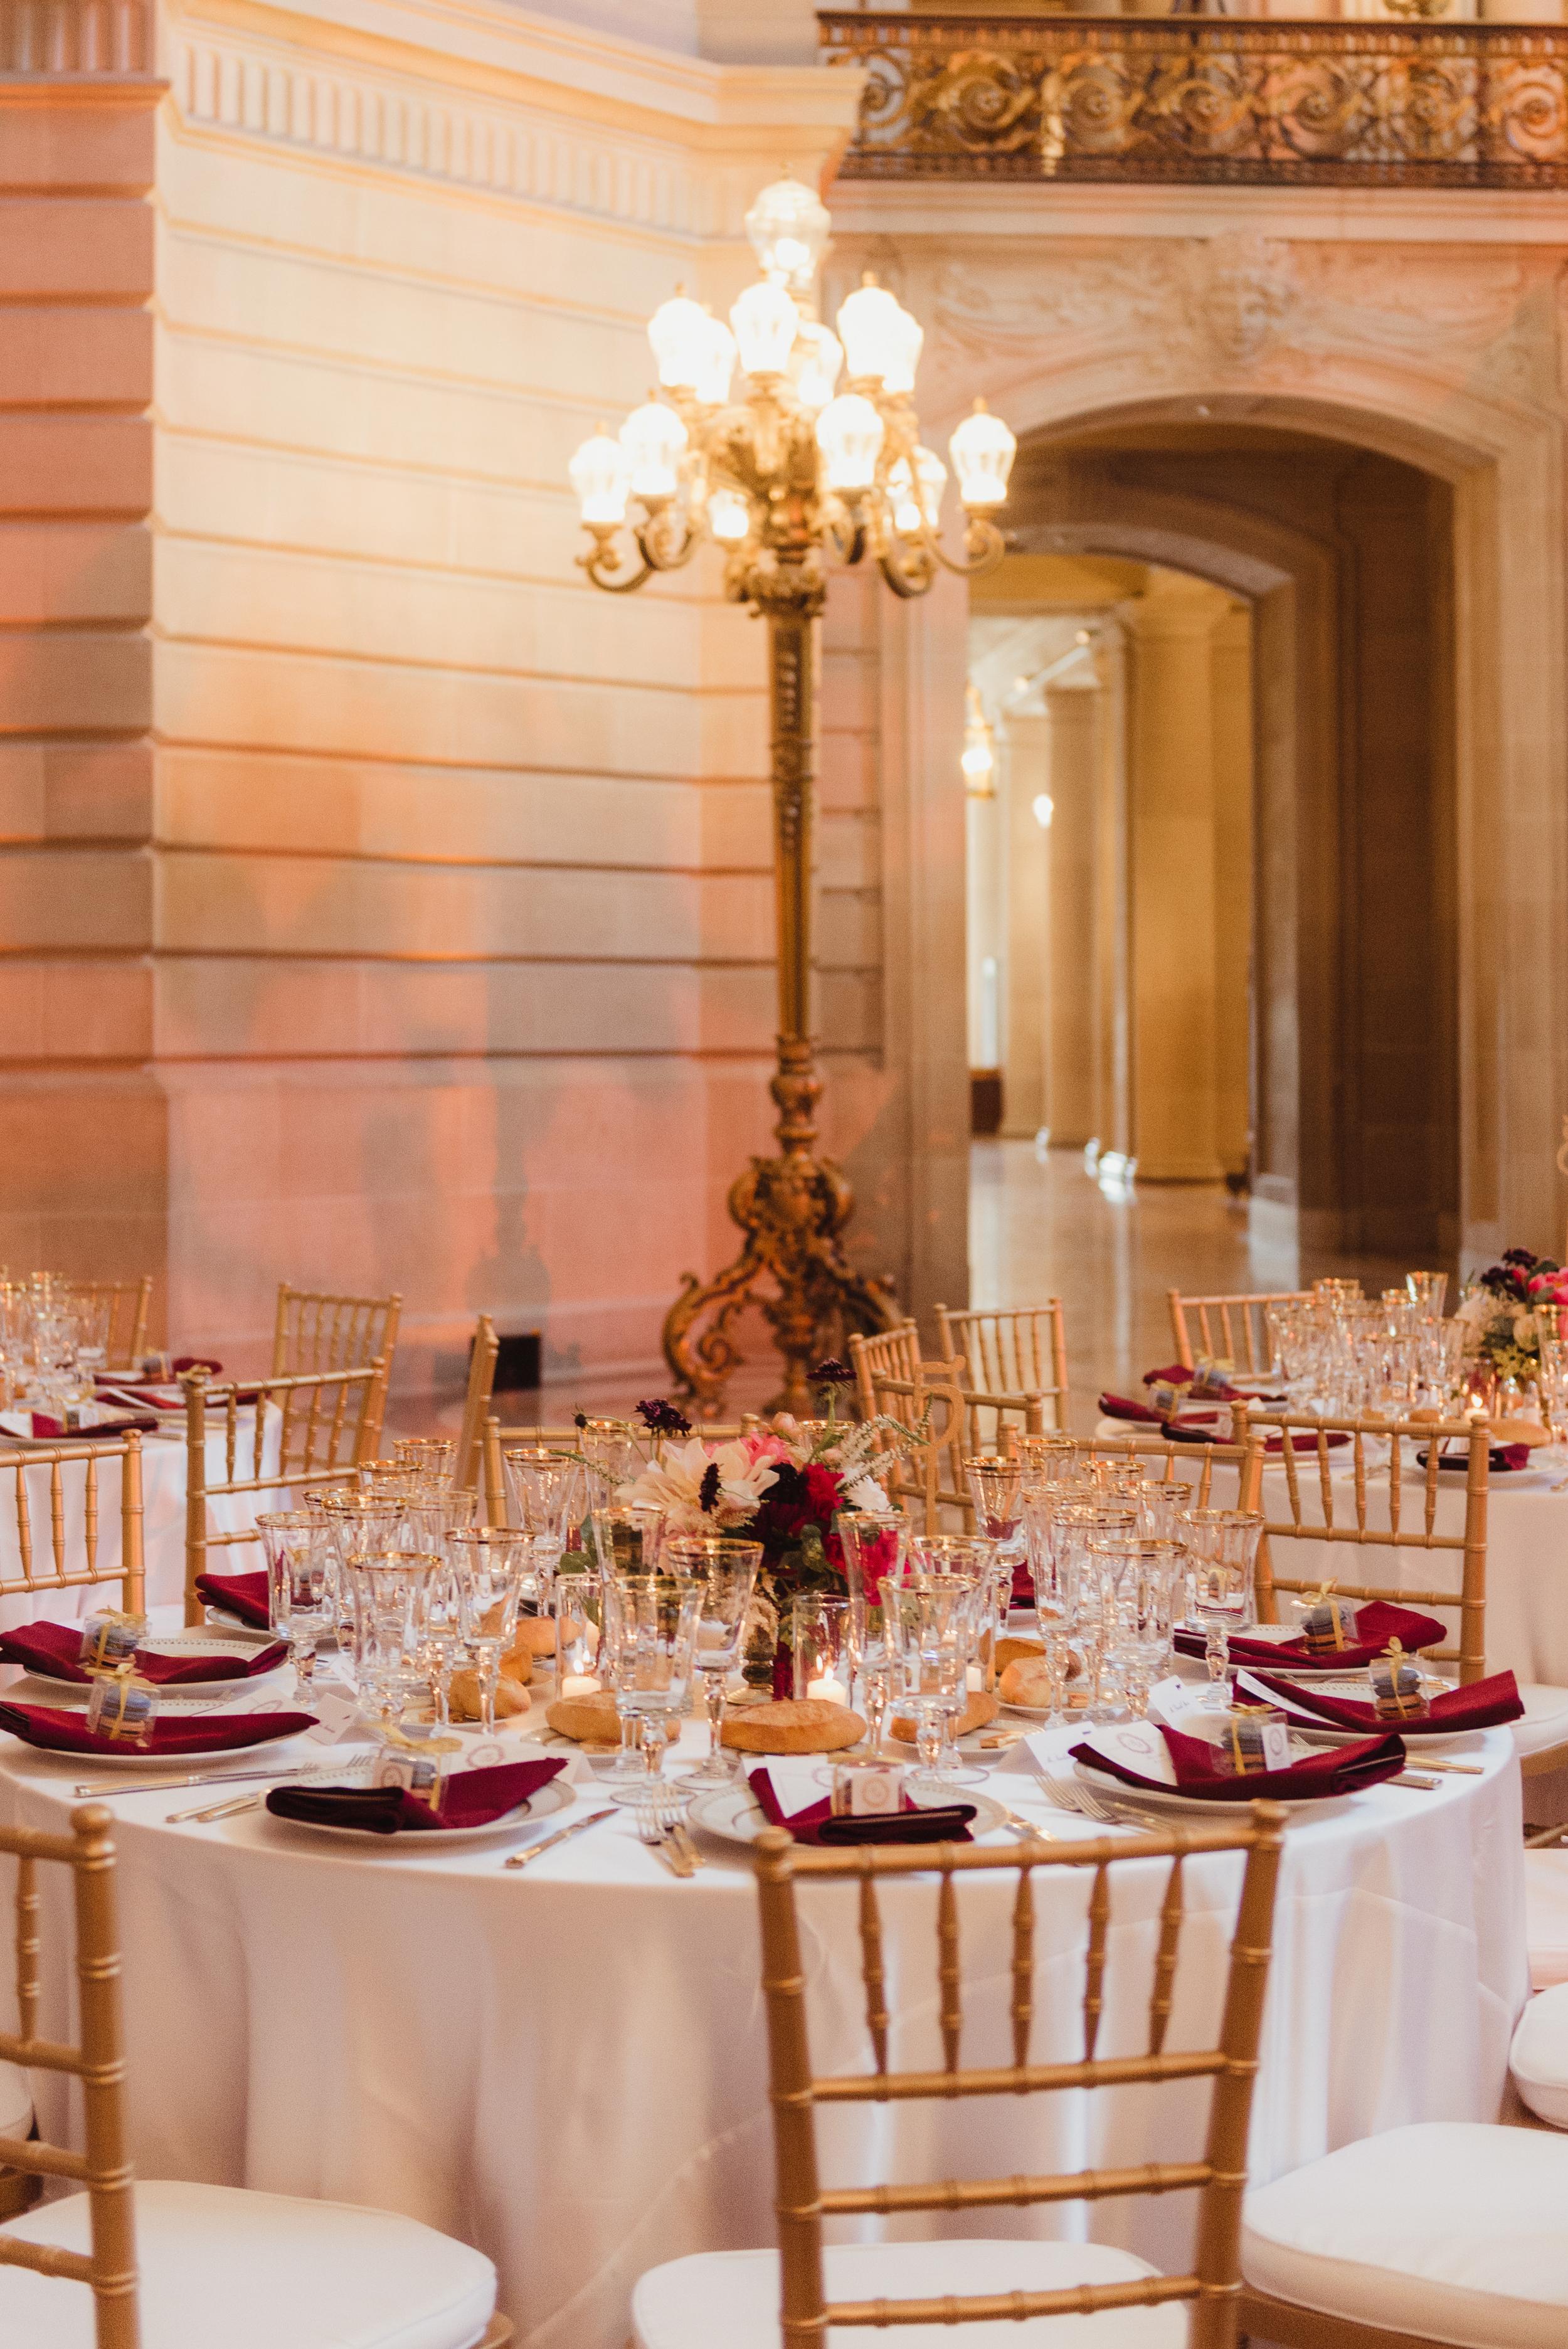 63-elegant-san-francisco-city-hall-wedding-vivianchen-0075.jpg